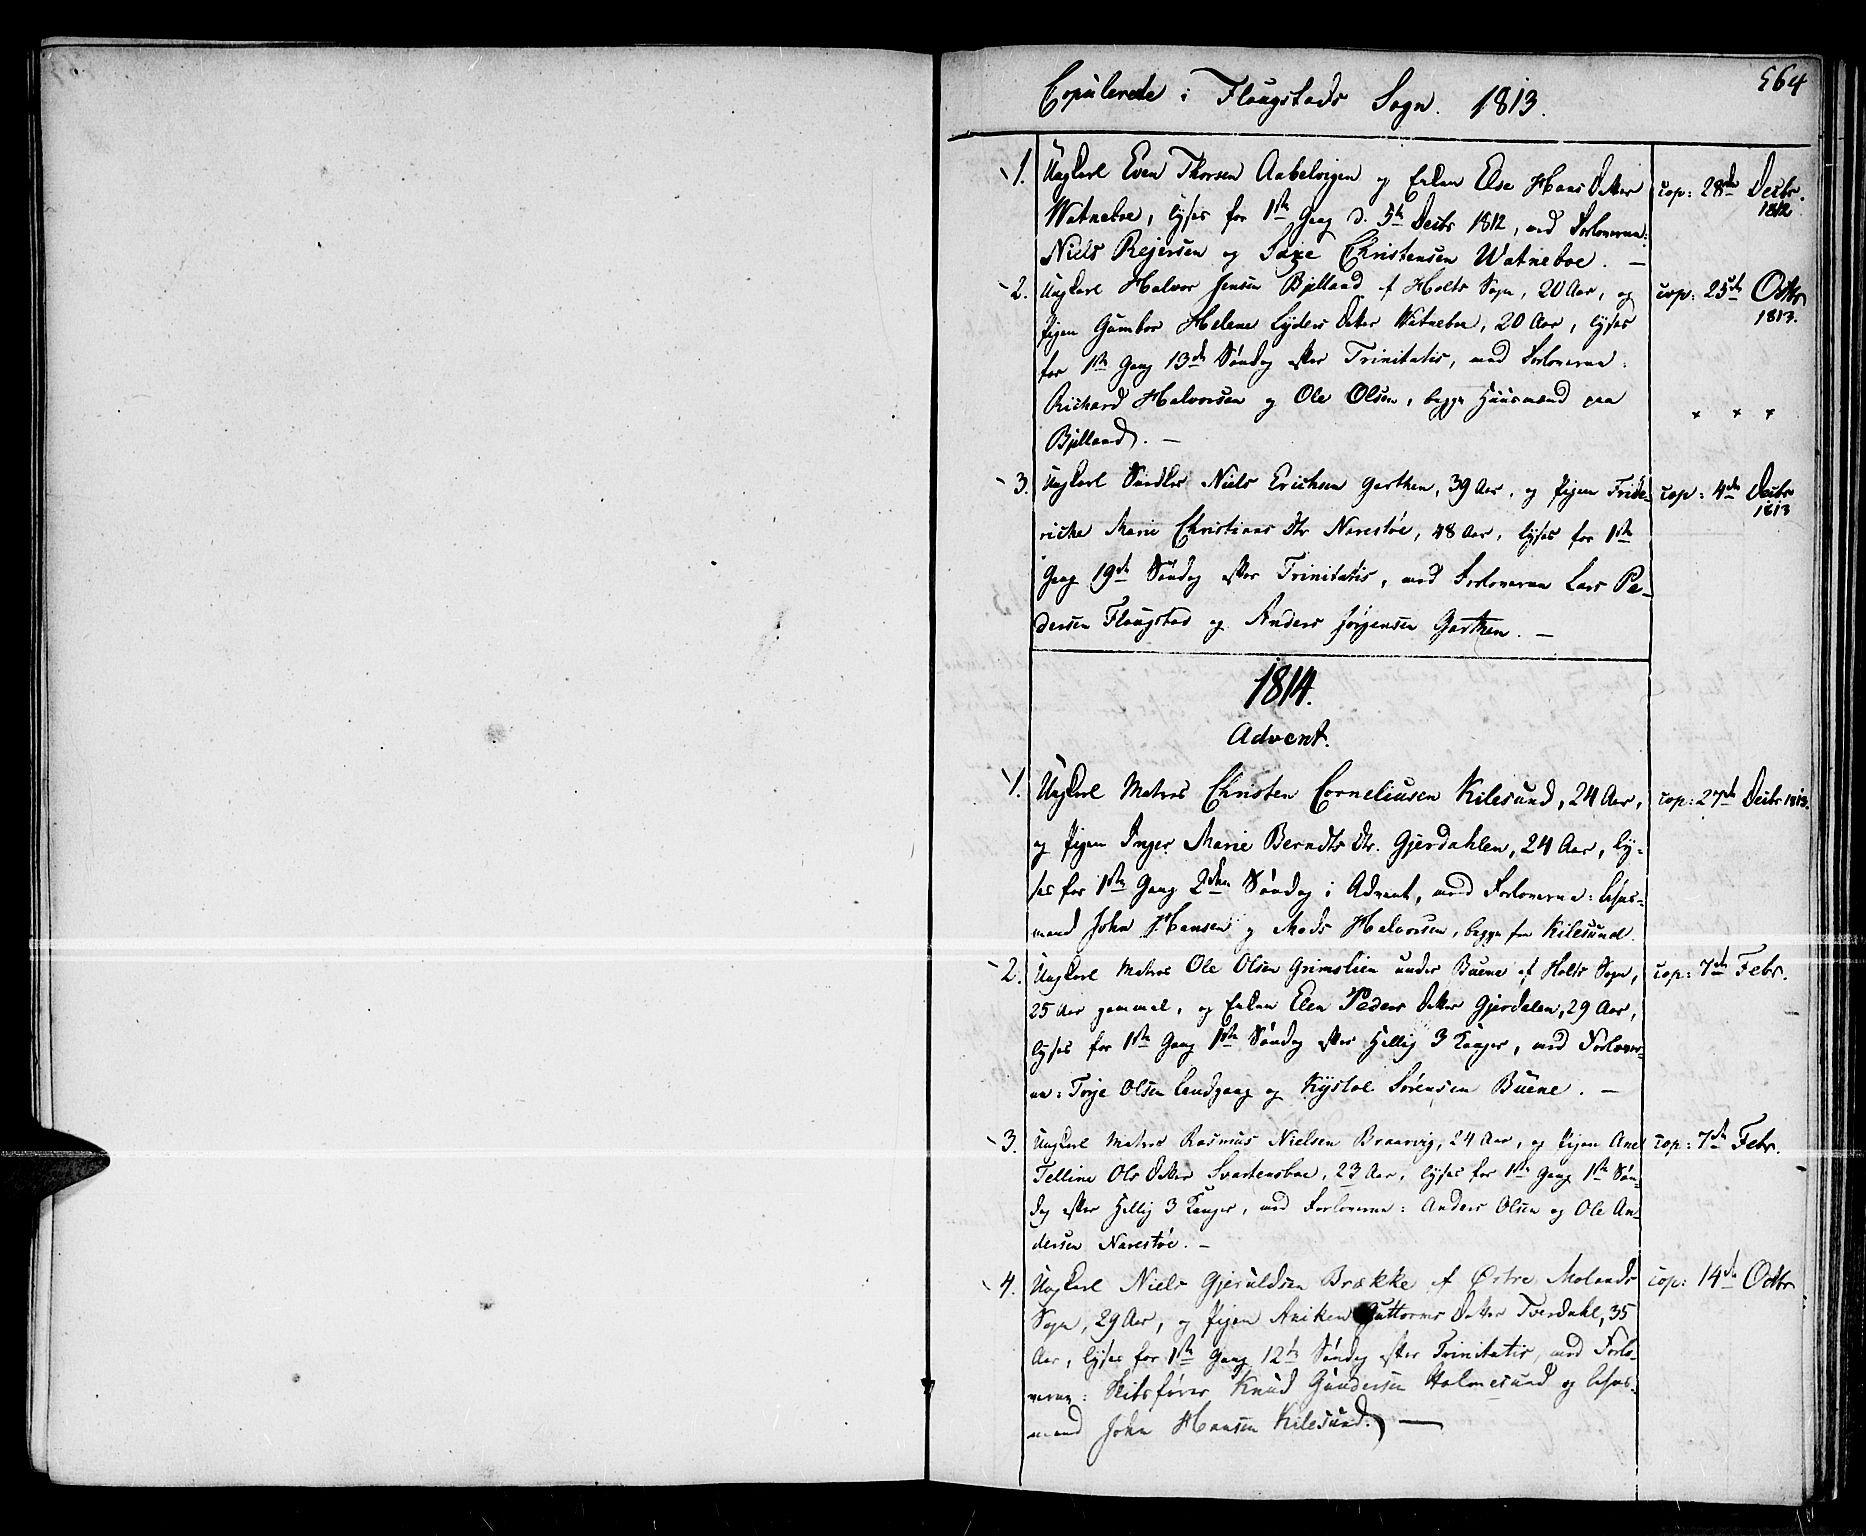 SAK, Dypvåg sokneprestkontor, F/Fa/Faa/L0002: Ministerialbok nr. A 2 /2, 1813-1824, s. 564